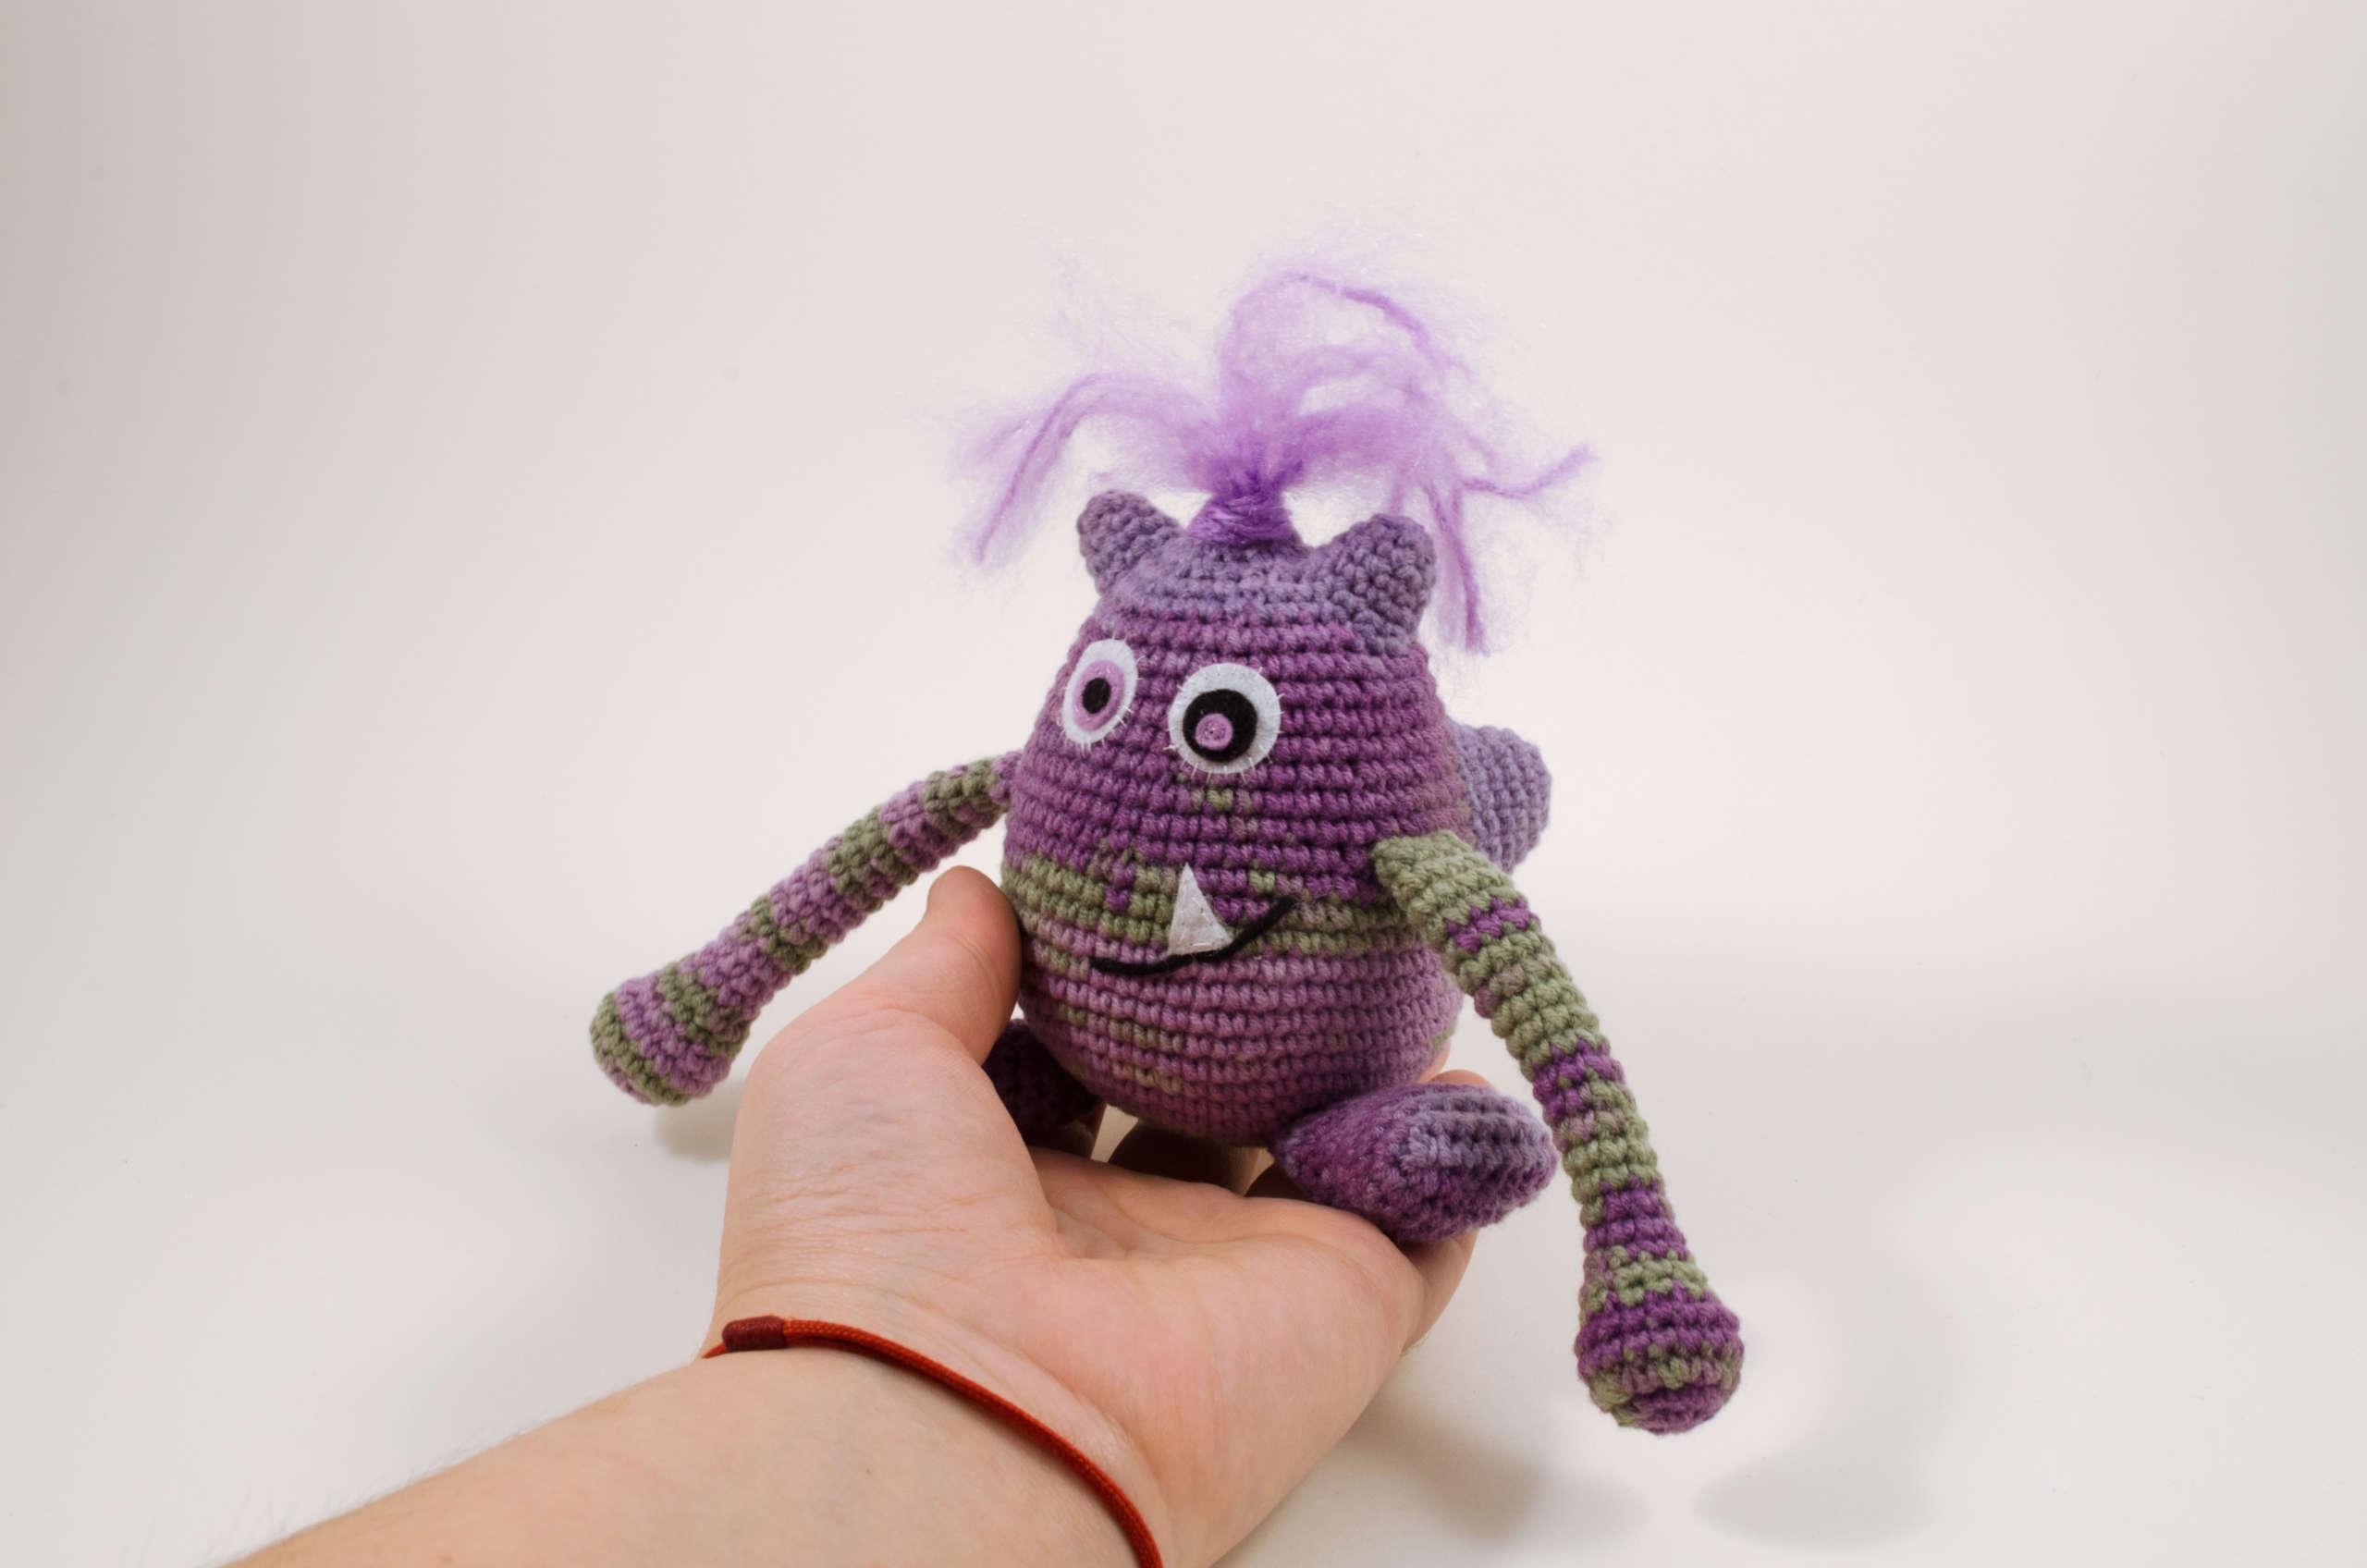 crochet purple monster front view